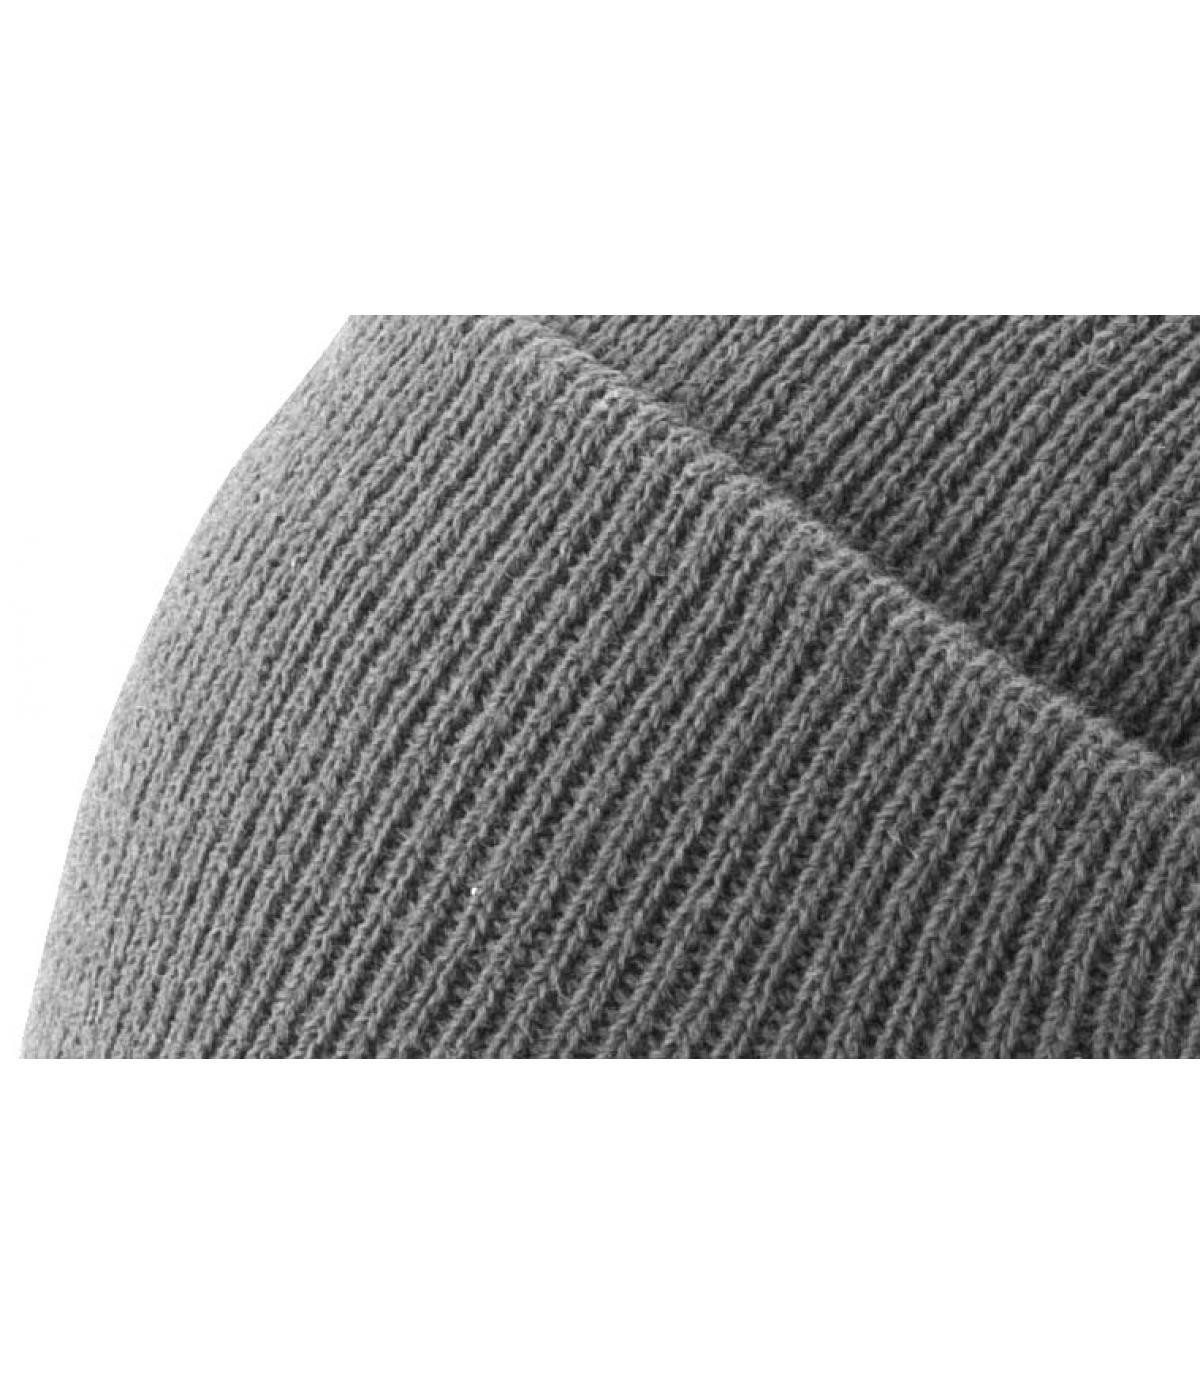 Detalles The uniform grey imagen 2